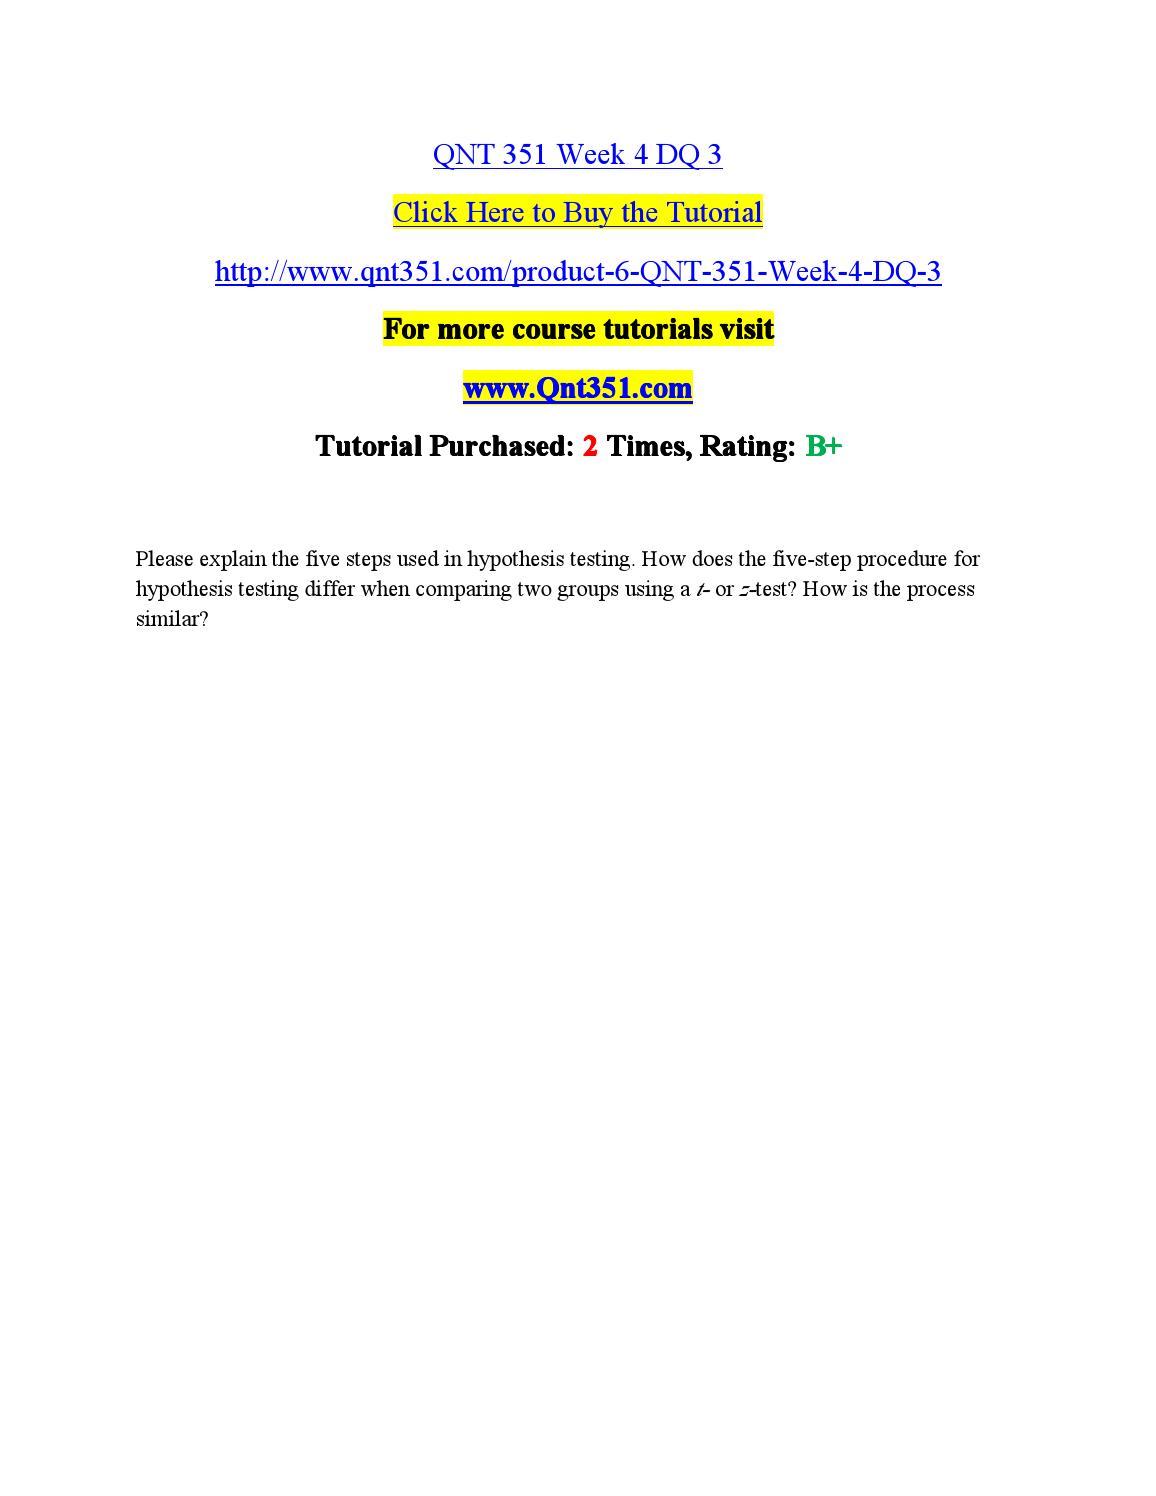 qnt 351 week 3 dq 4 Assignment summarizing and presenting data qnt 351 week 3 dq 1 qnt 351 week 3 dq 2 qnt 351 week 3 dq 3 qnt 351 week 3 dq 4 qnt 351 week 3 individual.